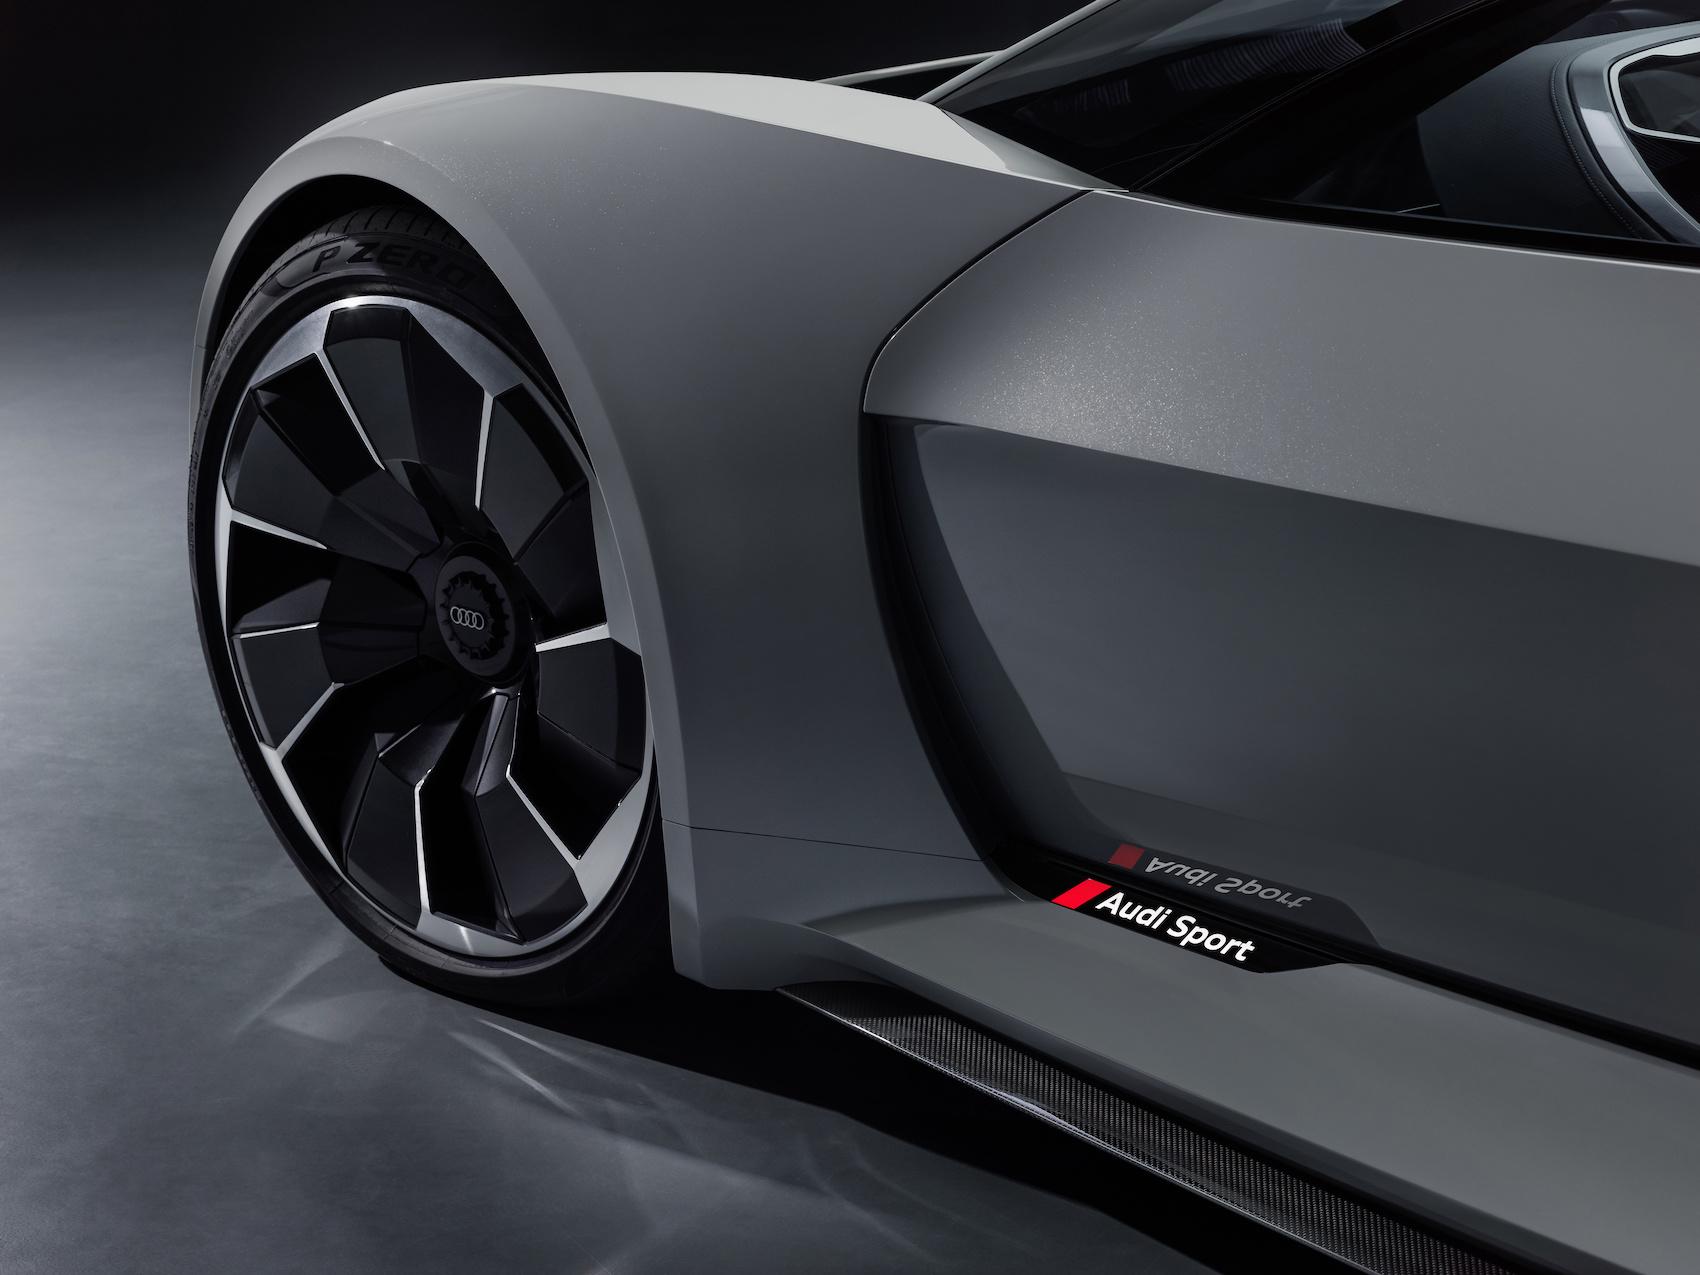 Designed by Audi in California: Die Linienführung des PB18 entstand im neuen Audi Designstudio in Malibu. (AUDI)